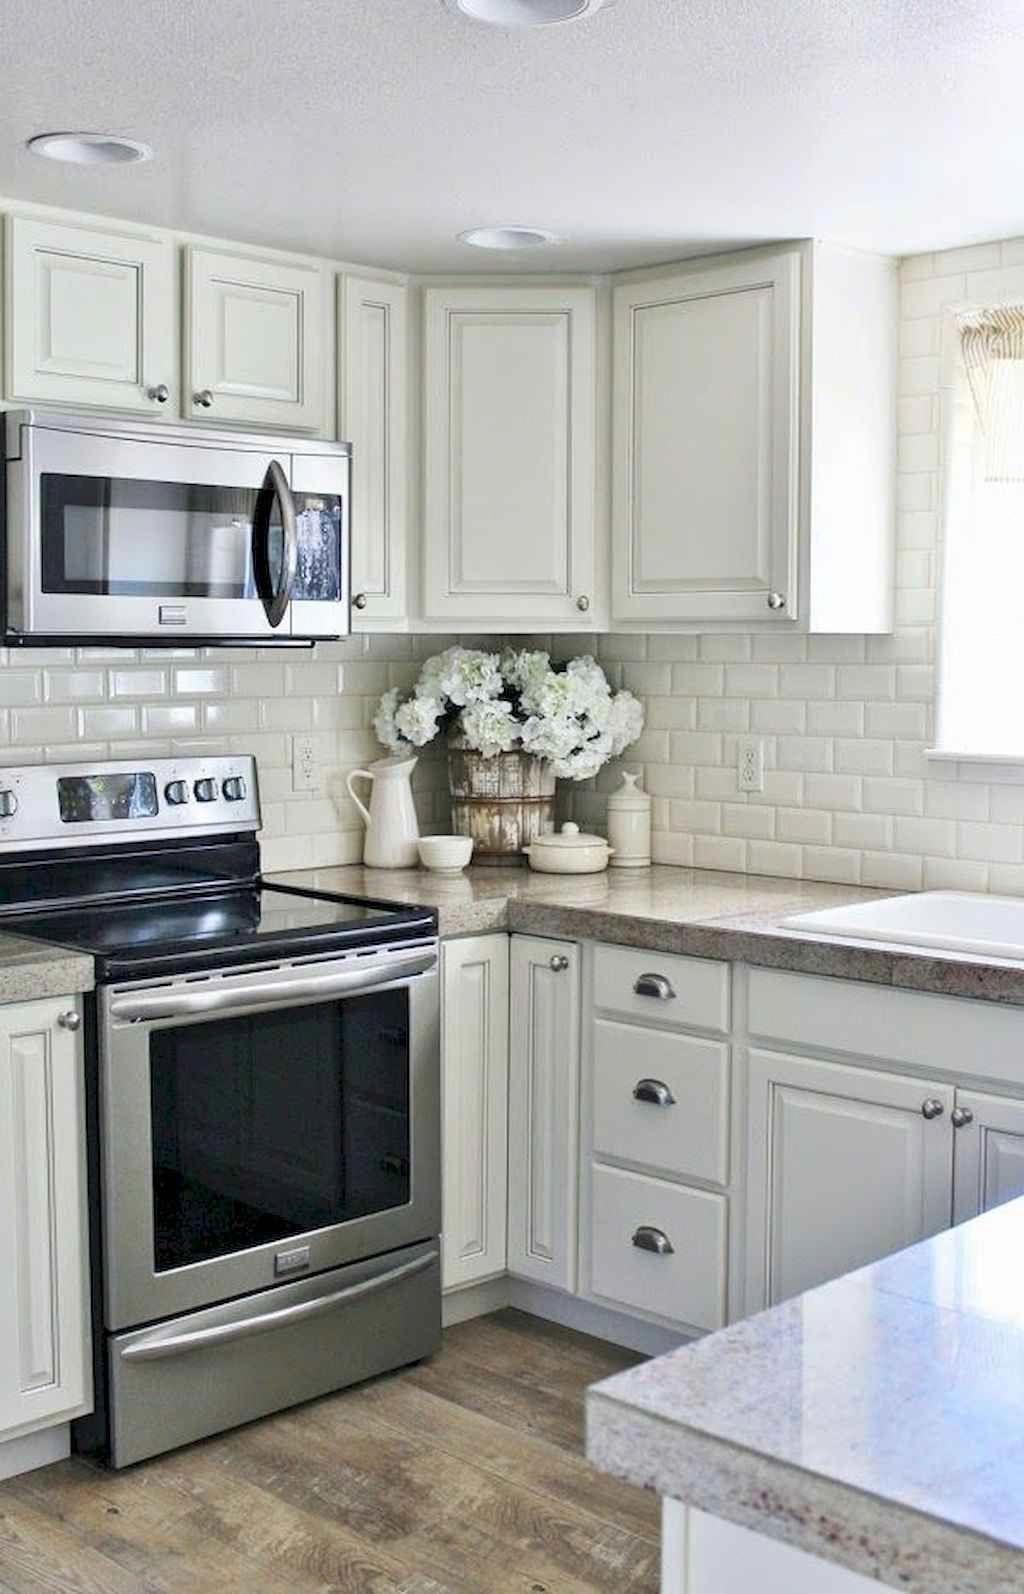 65 gray kitchen cabinet makeover design ideas new kitchen cabinets grey kitchen cabinets on kitchen decor grey cabinets id=37801